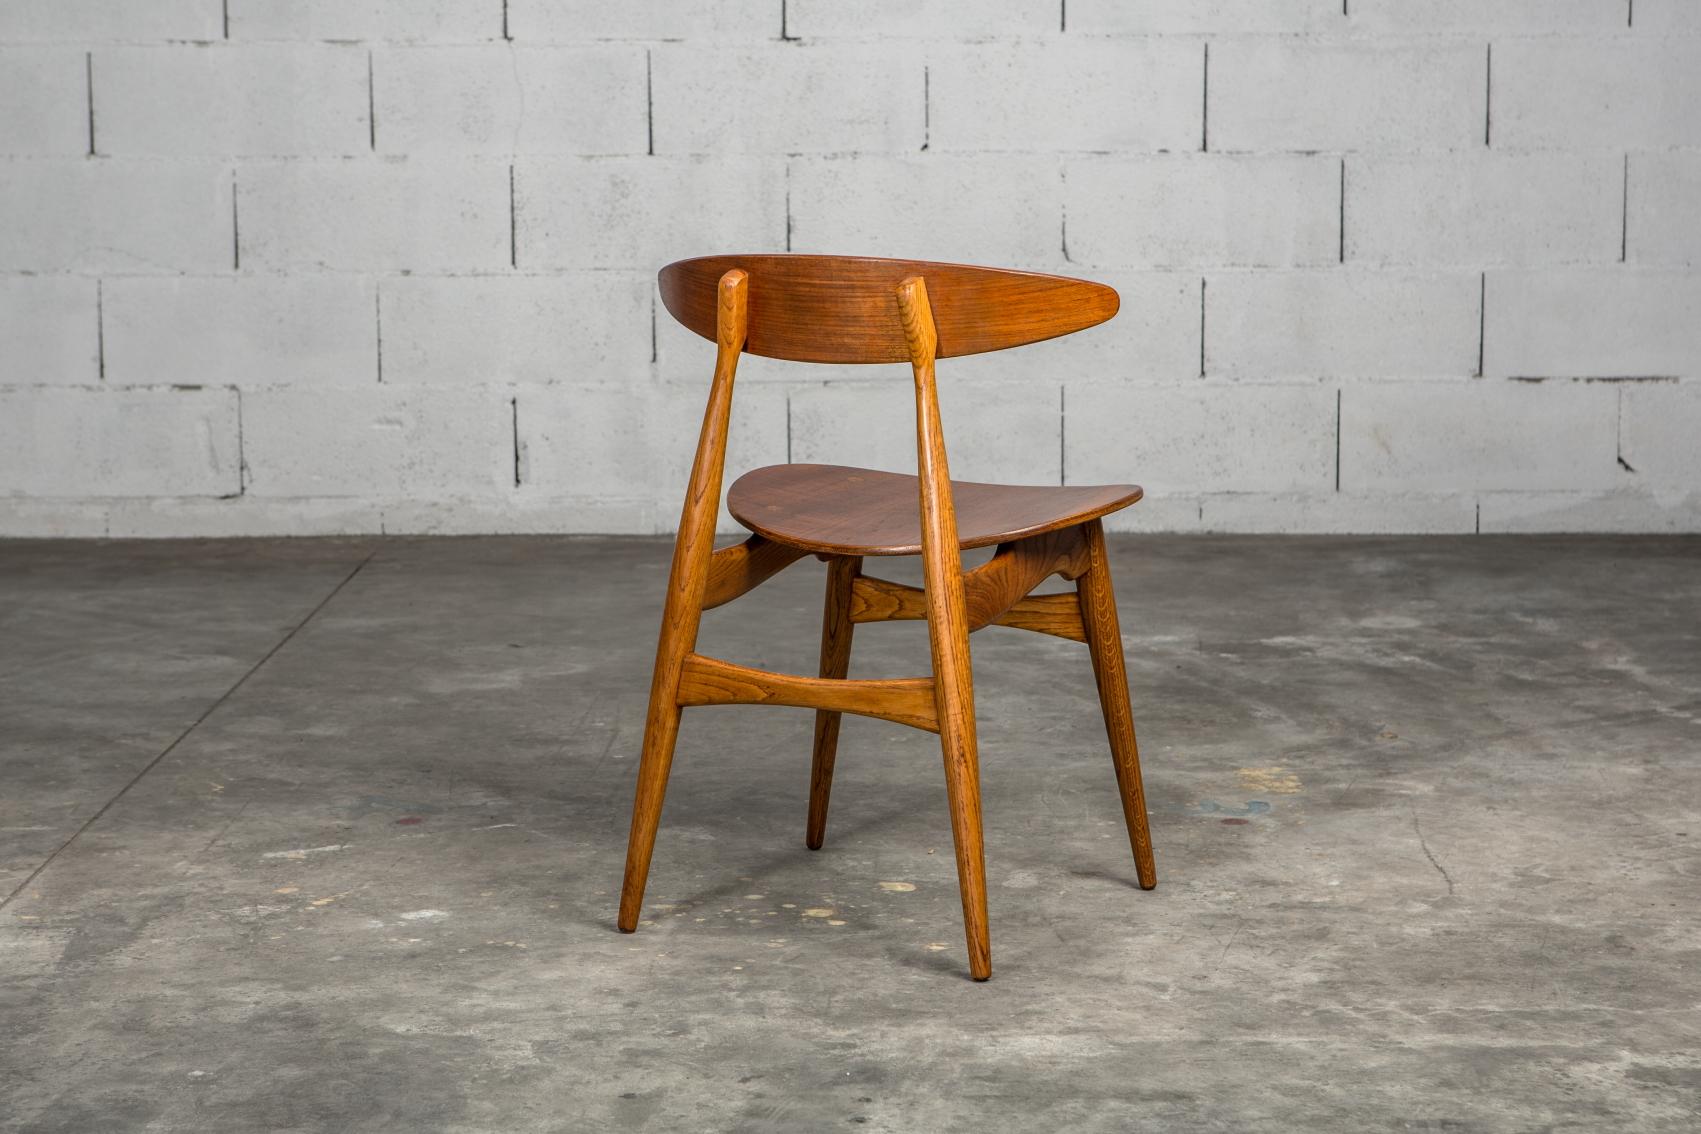 Molded teak backrests and oak frames CH 33 chairs - Hans J. Wegner for Carl Hansen & Son - 3/4 back view